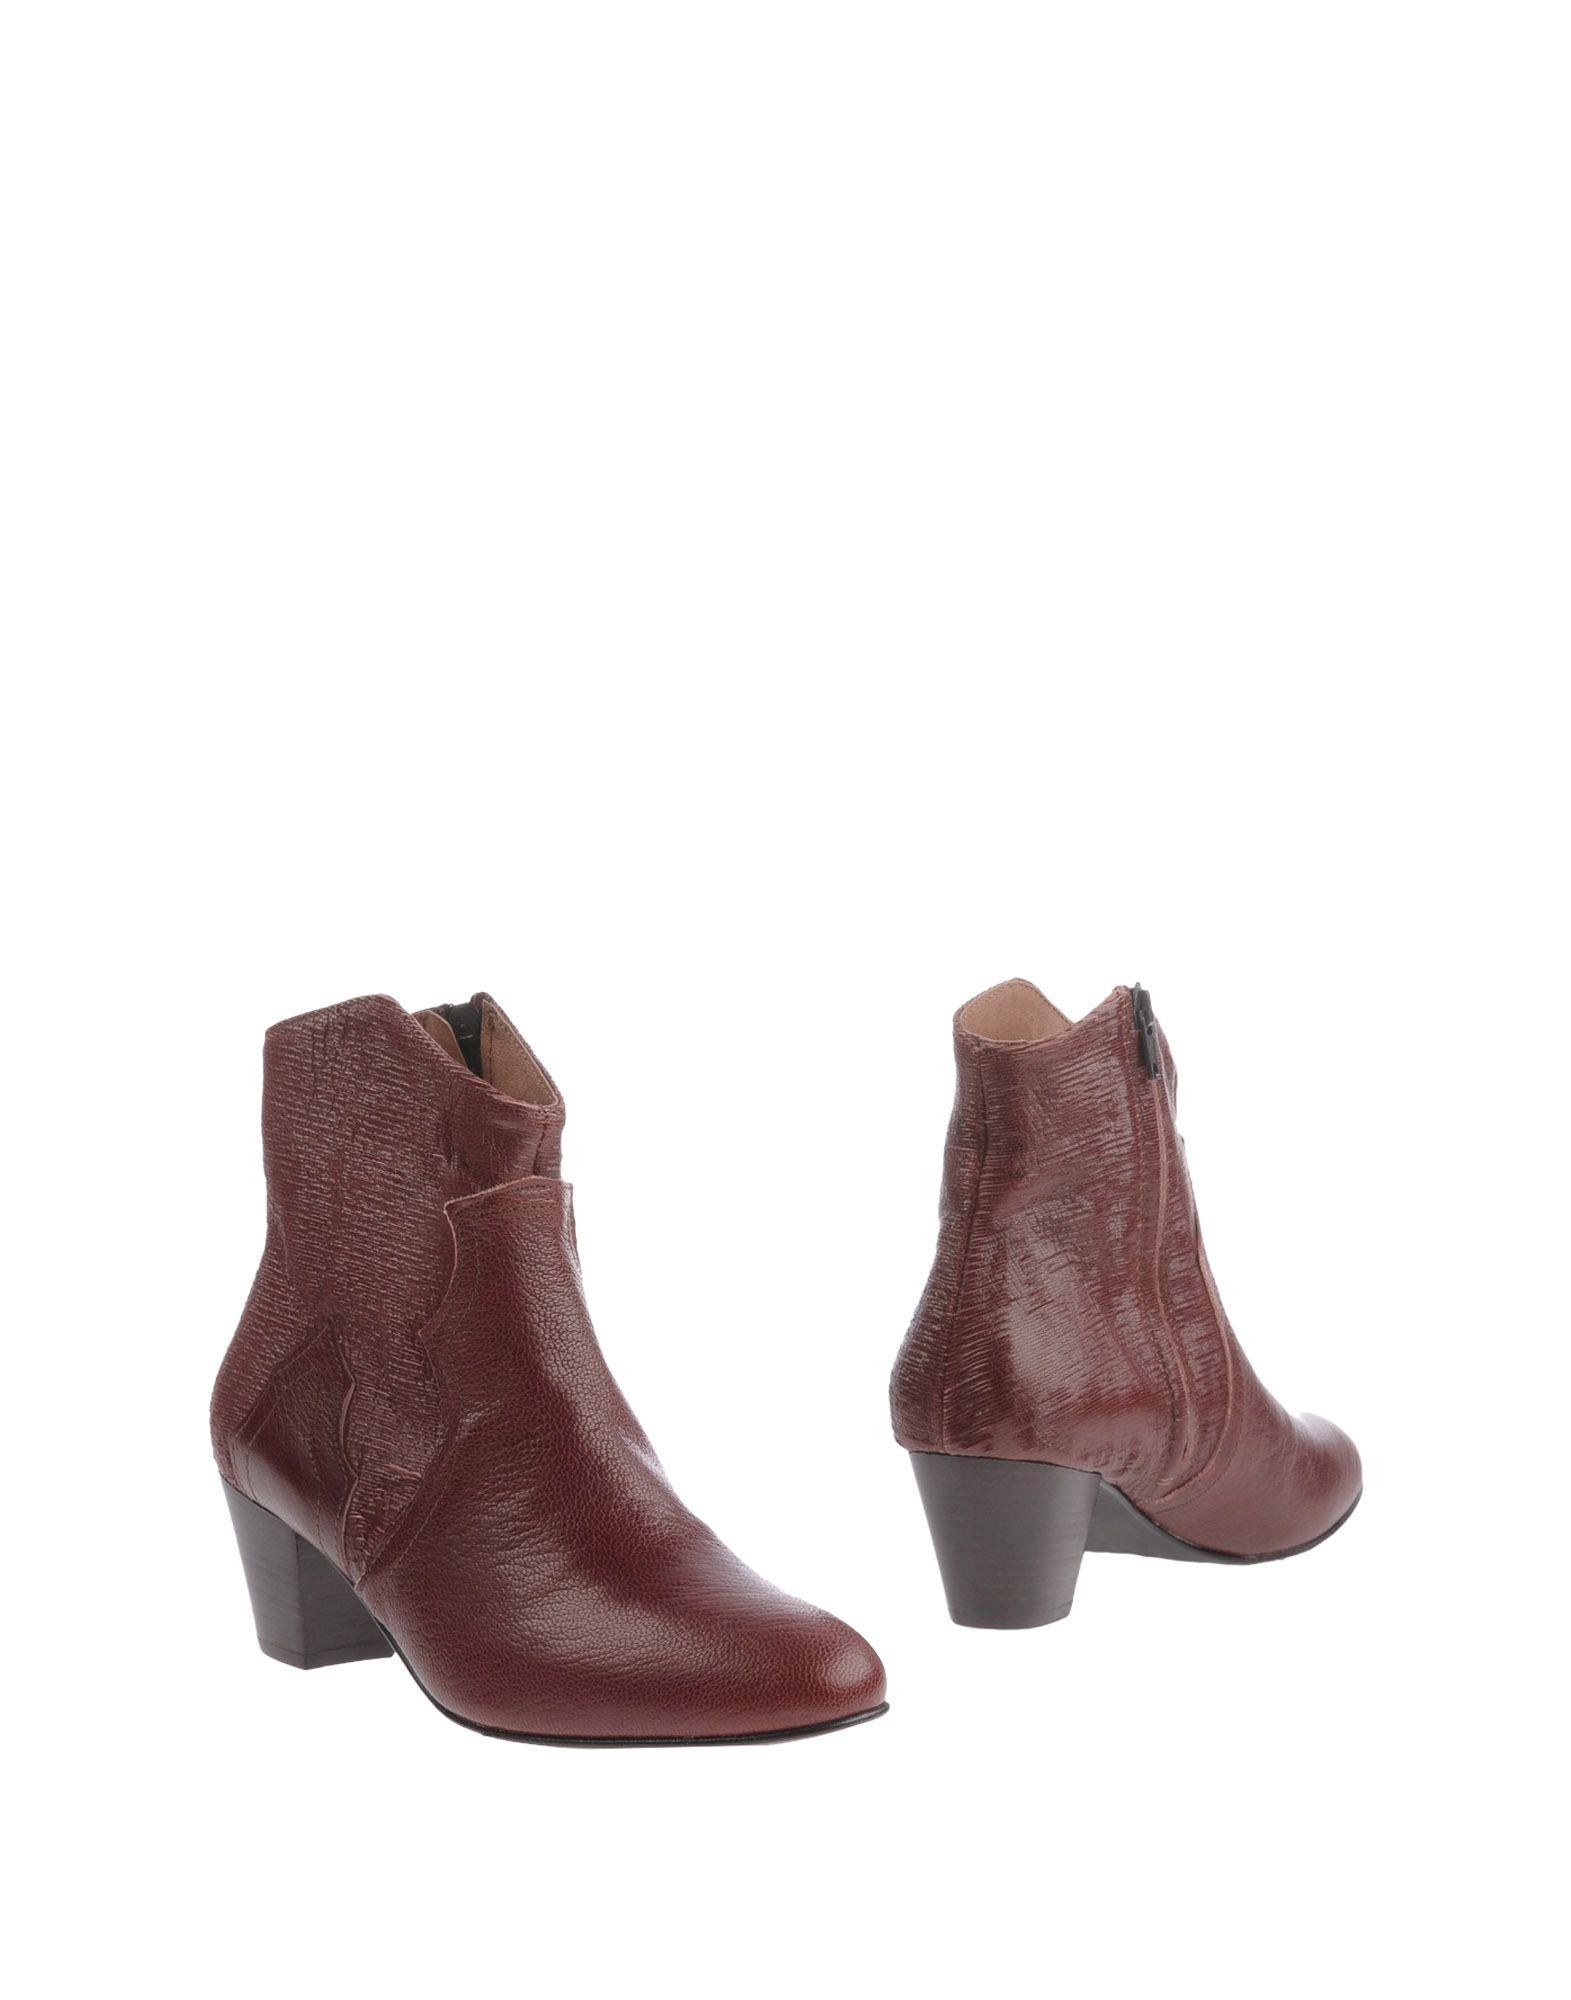 1725.A Stiefelette Damen  11220004OO Gute Qualität beliebte Schuhe